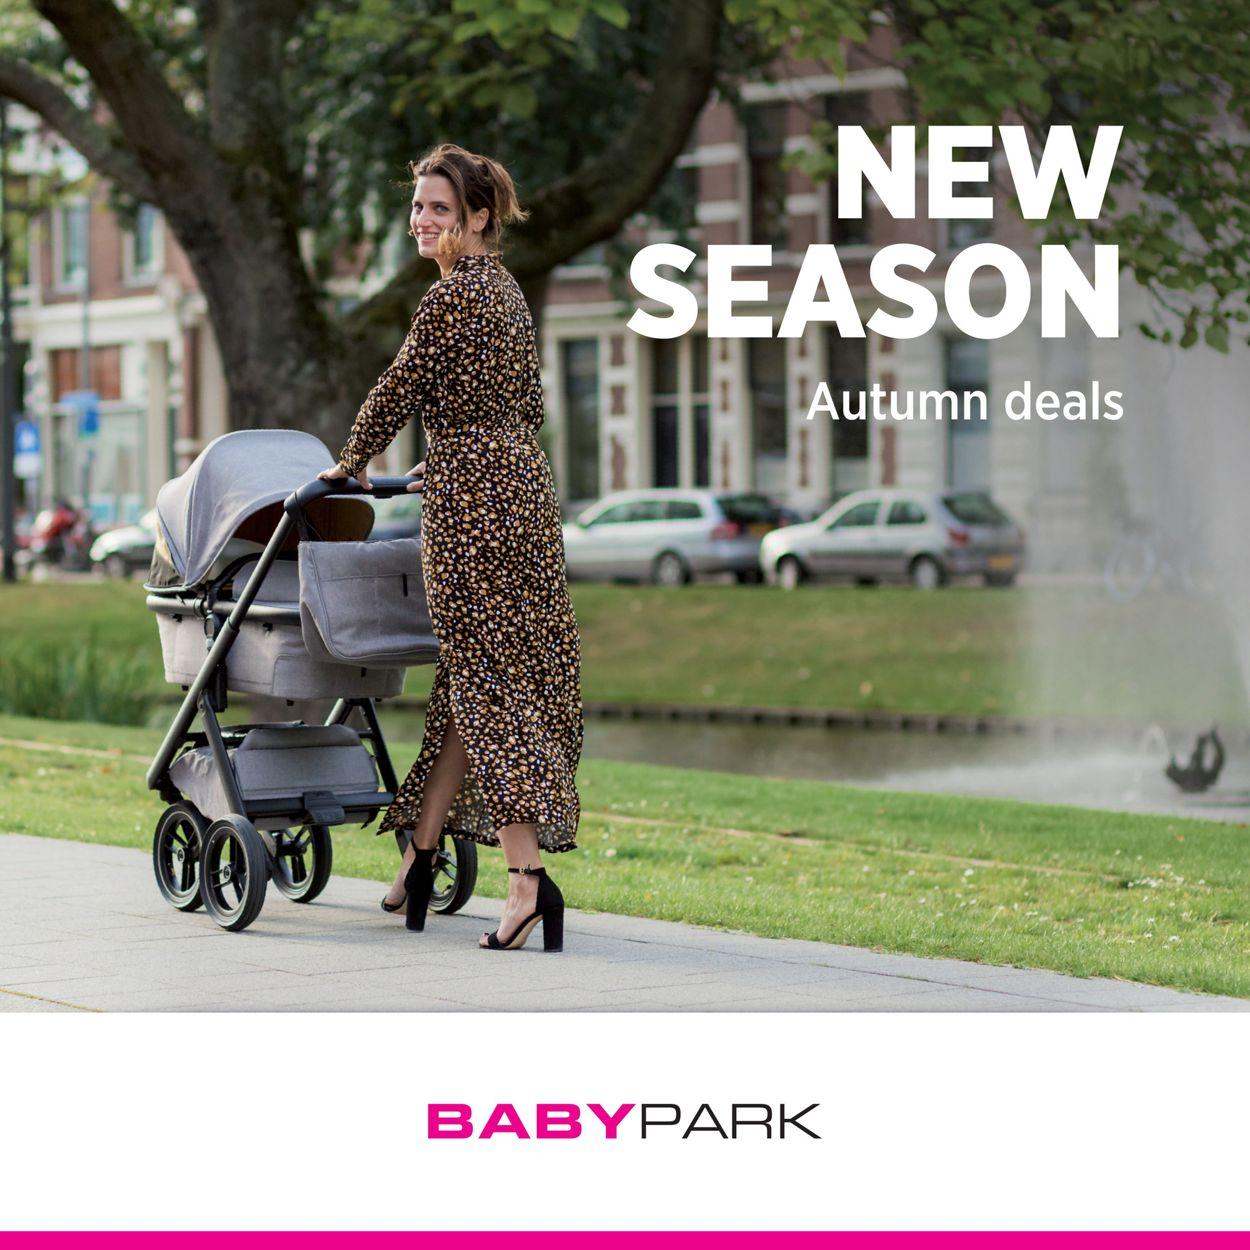 Catalogus van Babypark van 01.10.2020